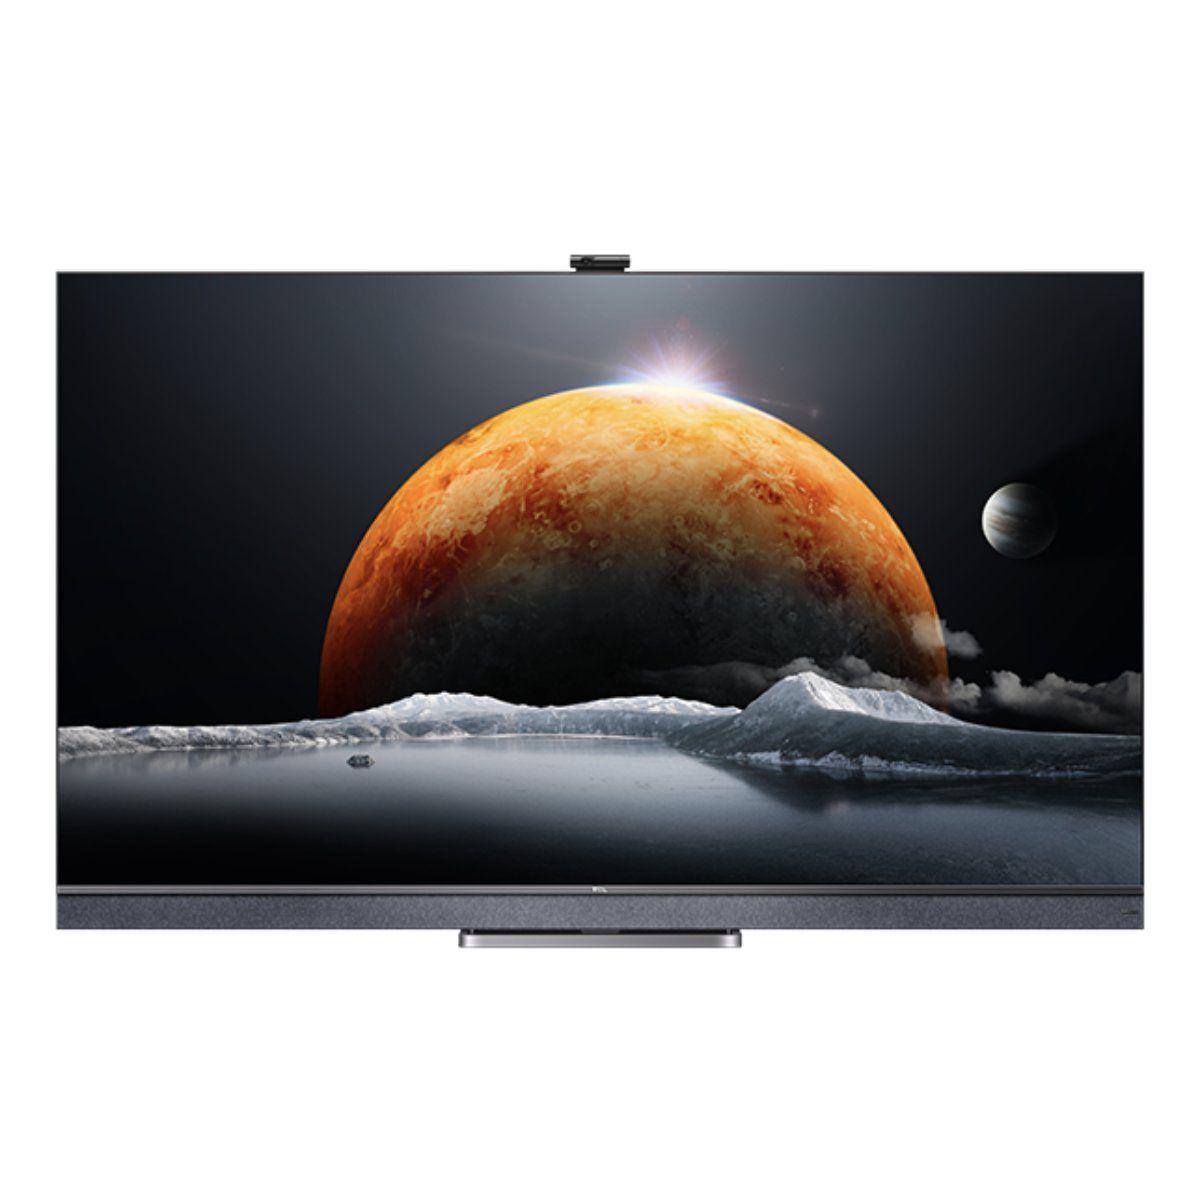 टीसीएल C825 55-inch 4K Mini LED टीवी